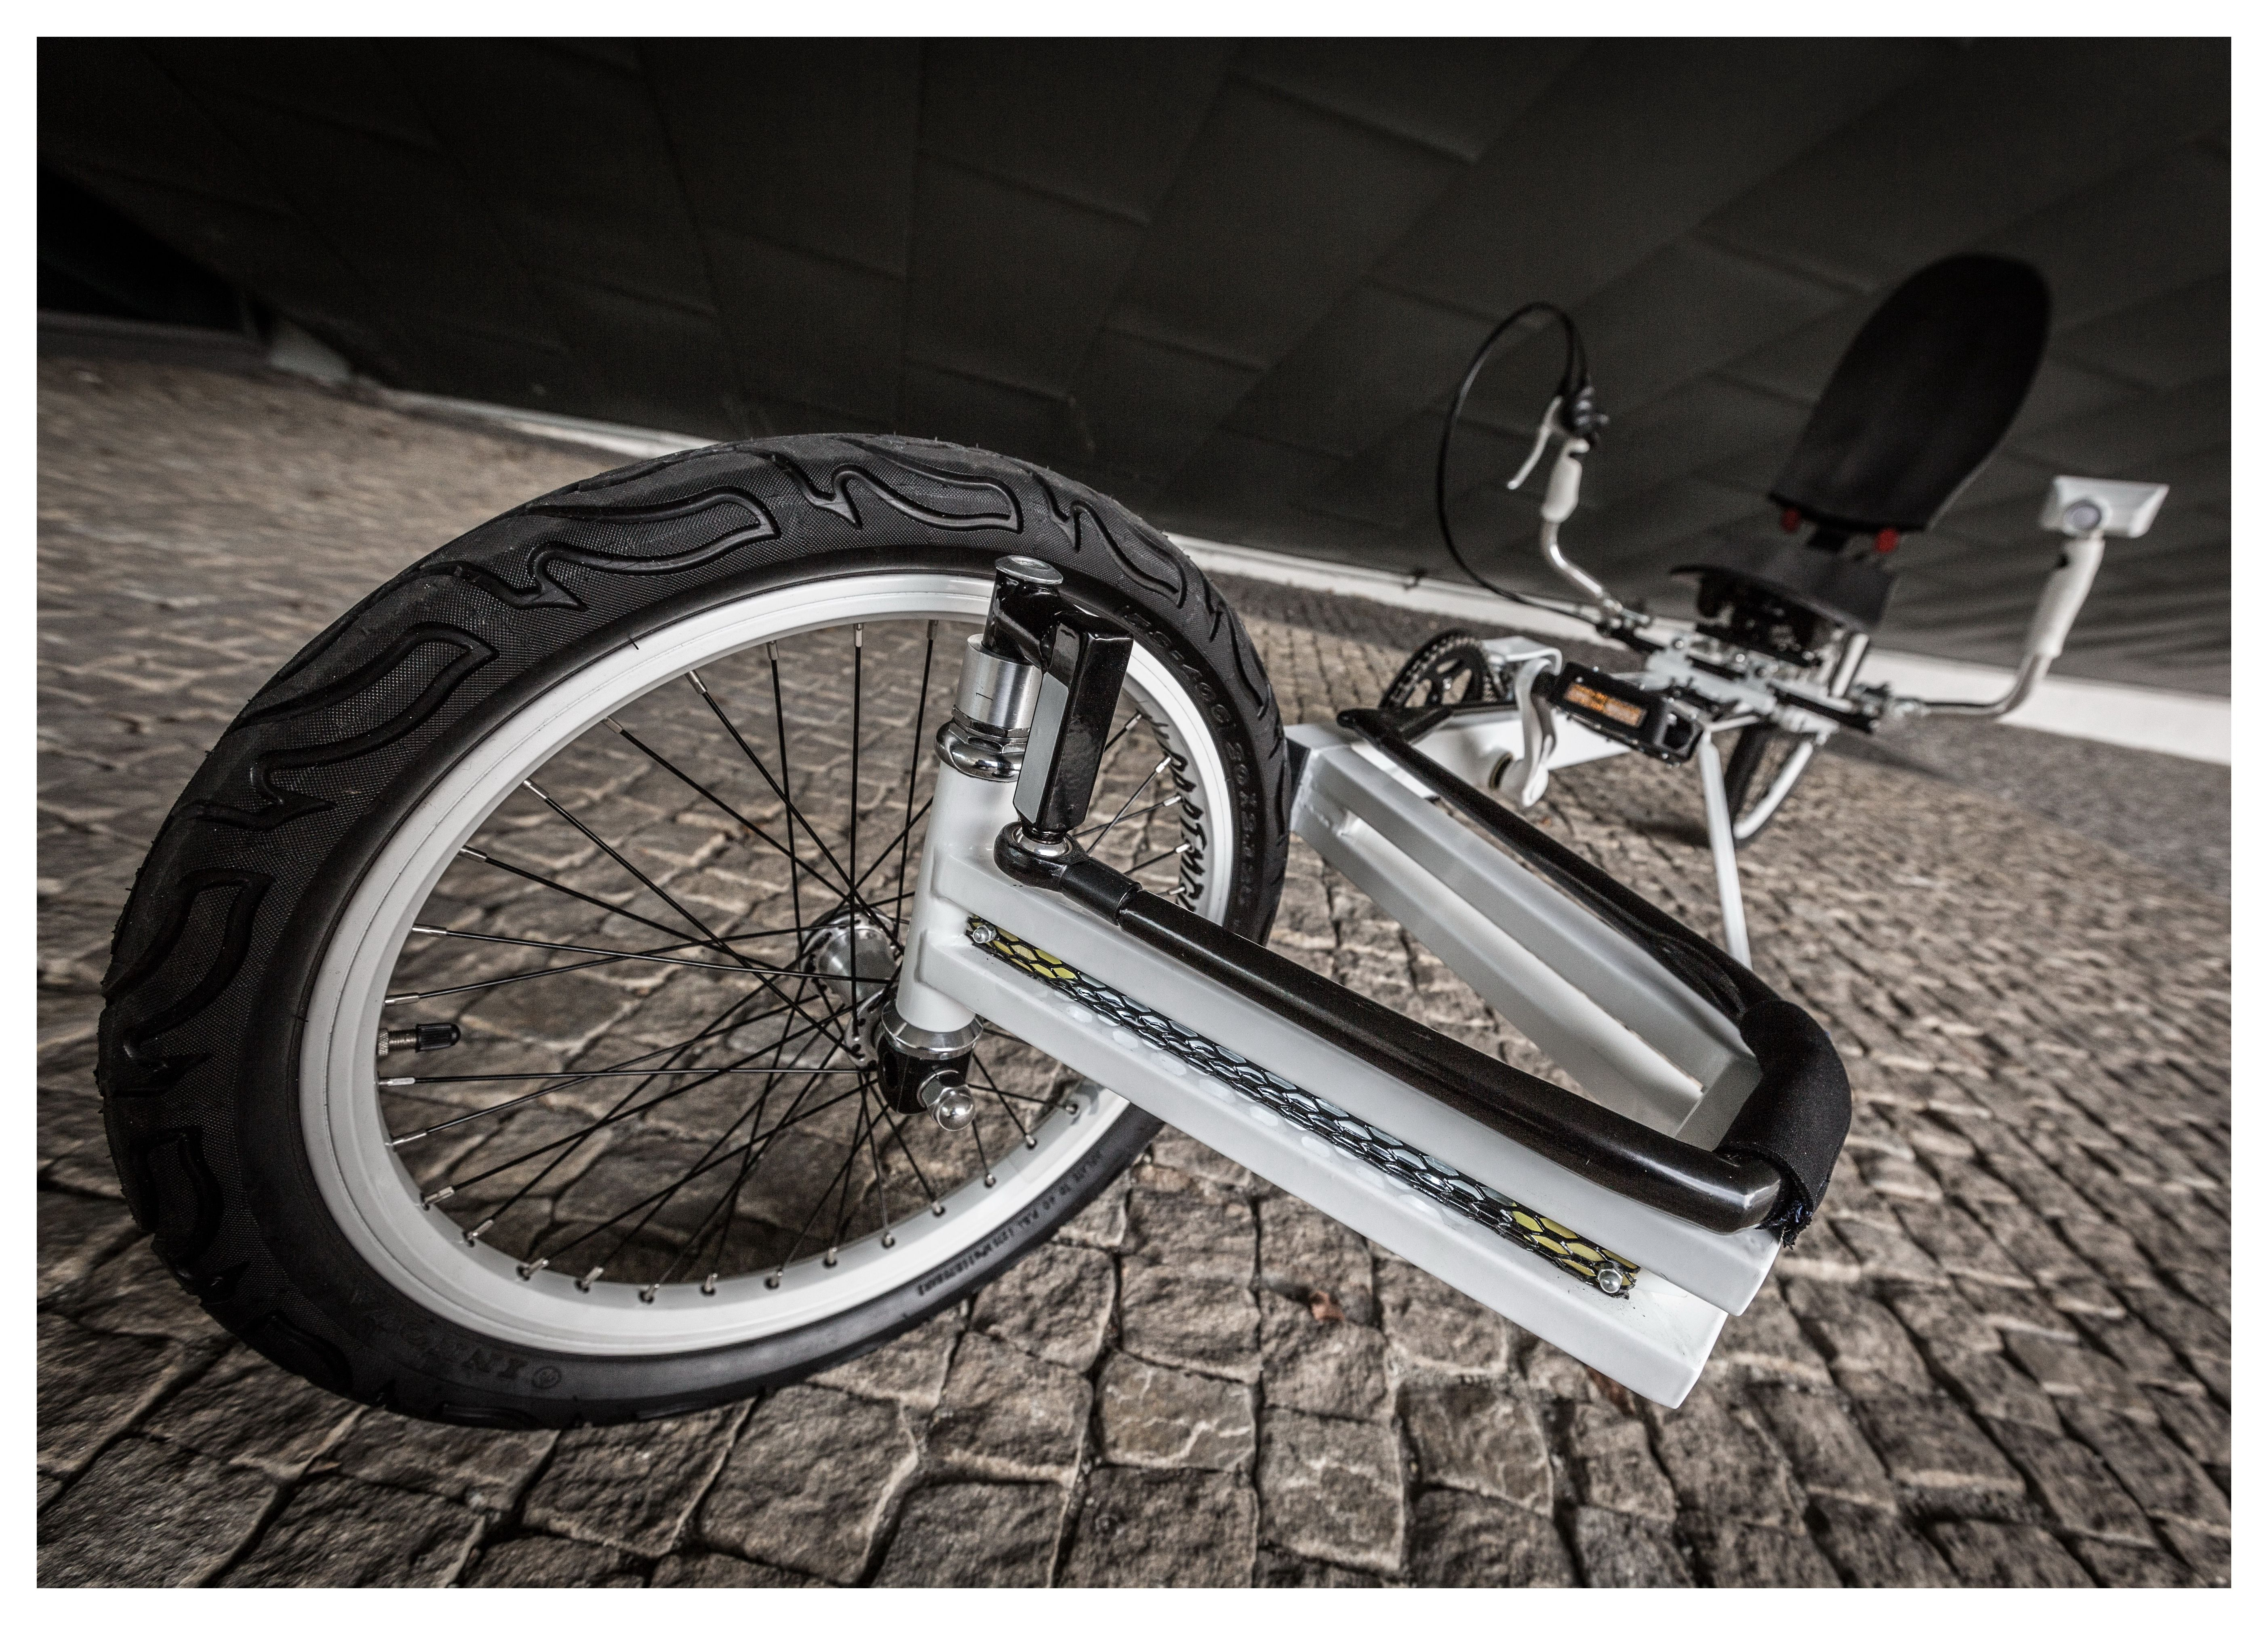 Gambit Recumbent Bike Cool Recumbent Bicycles Trikes